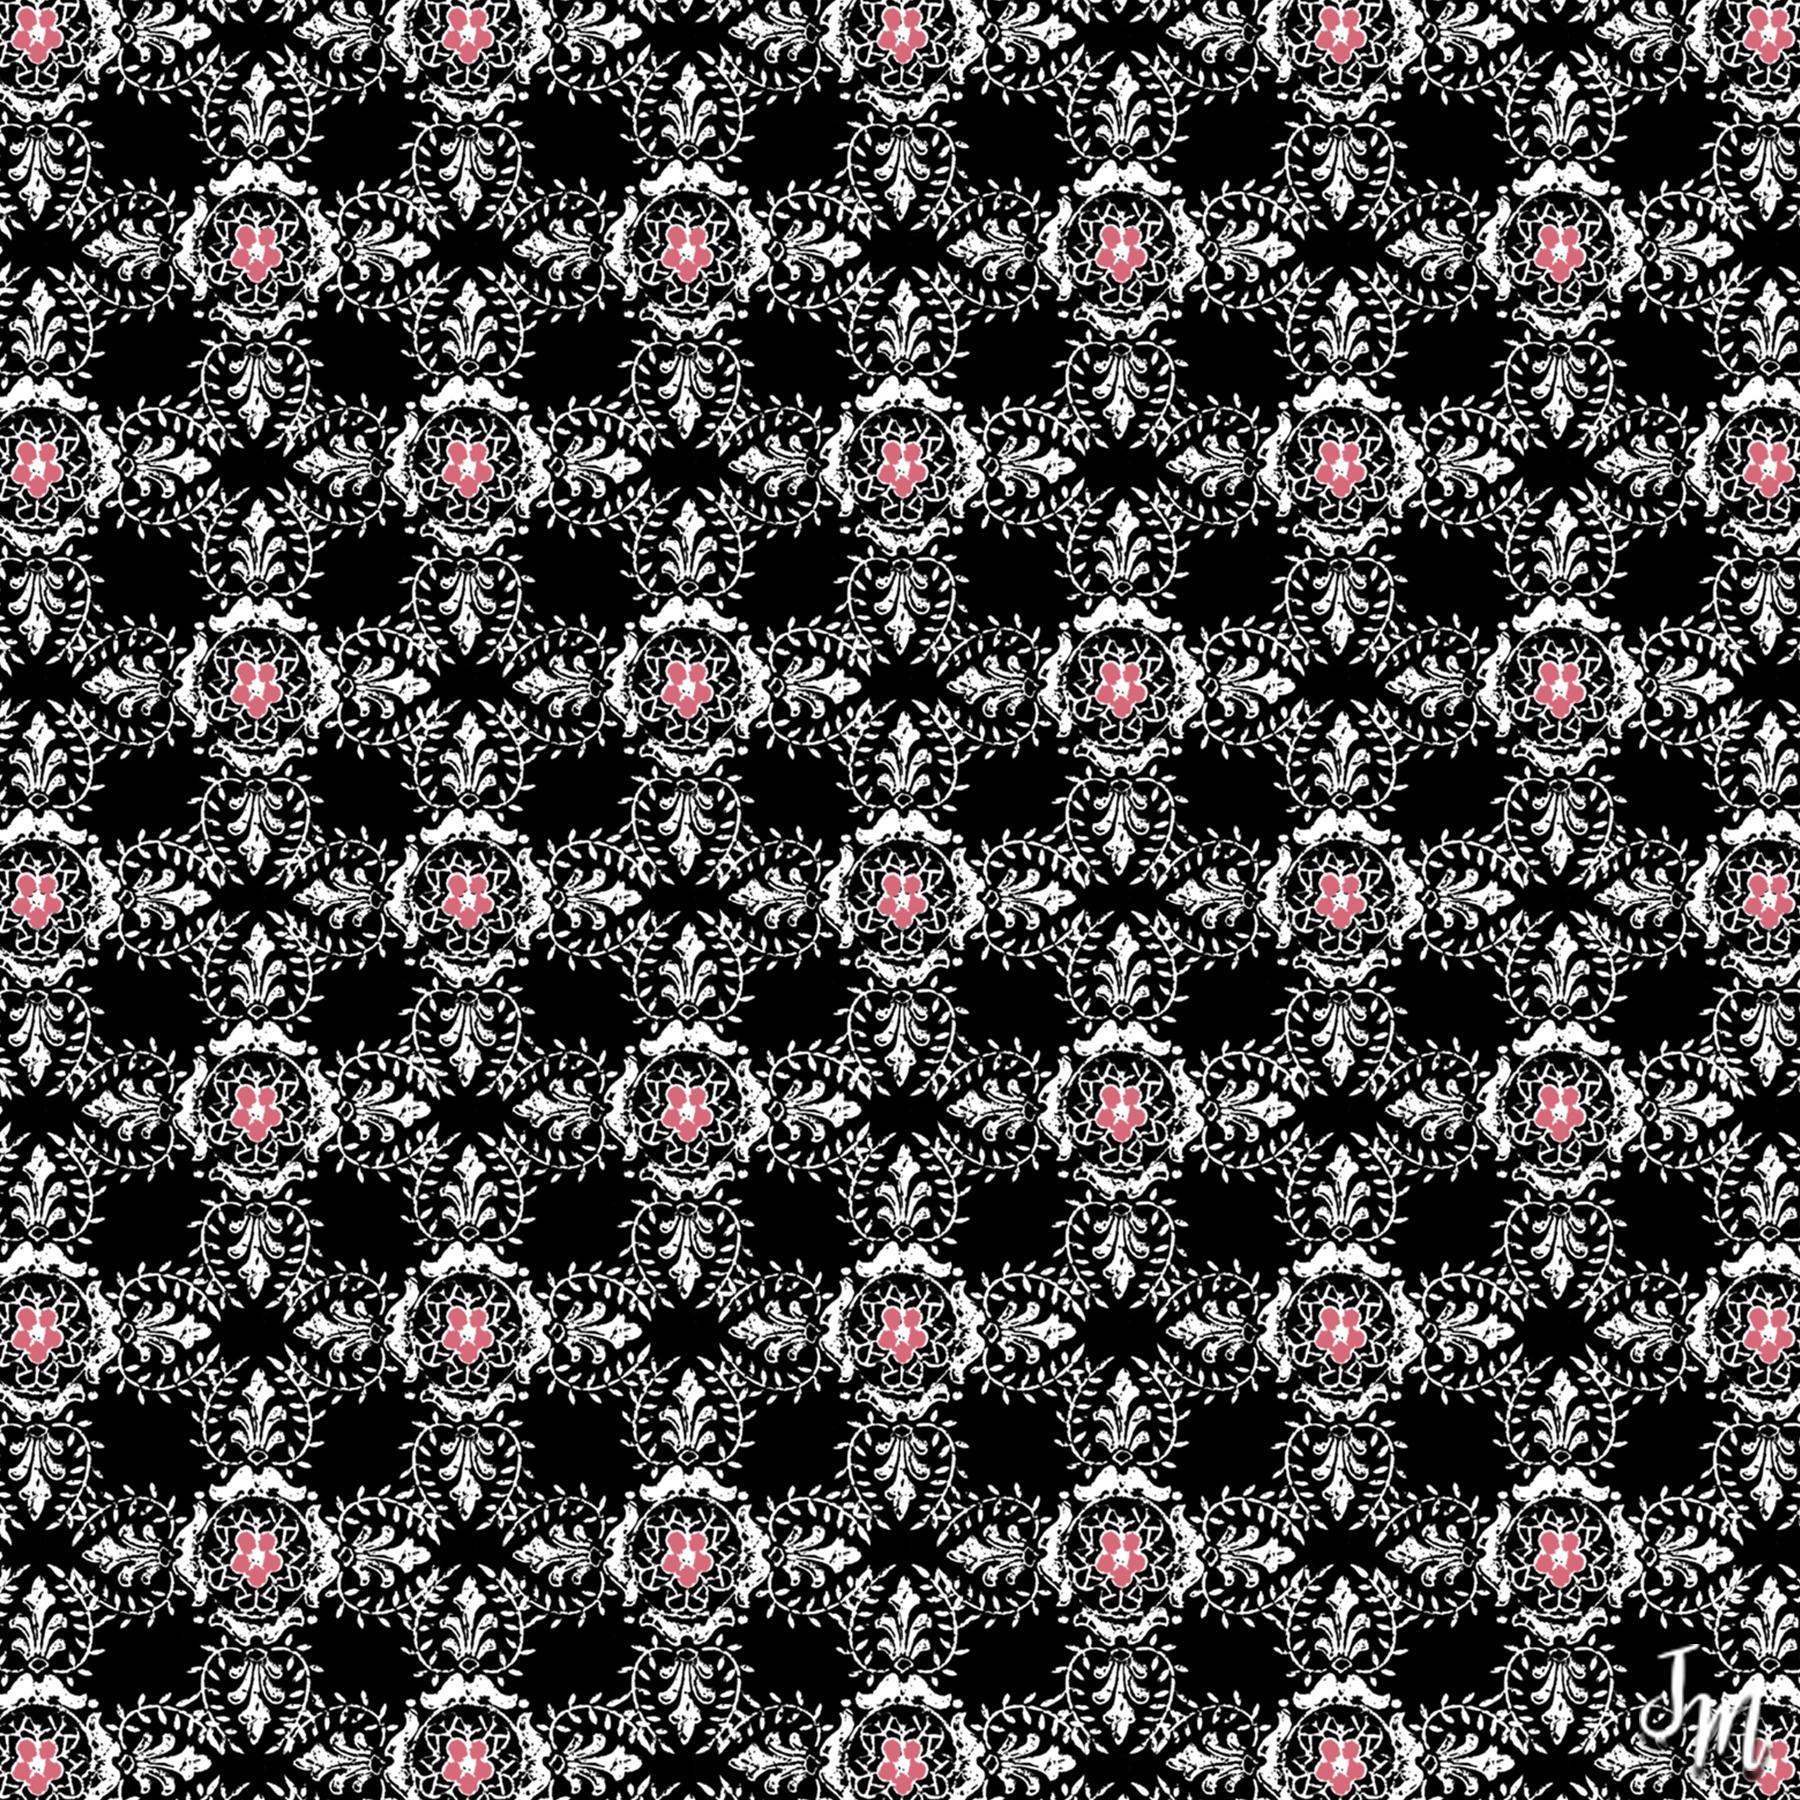 053C black.jpg